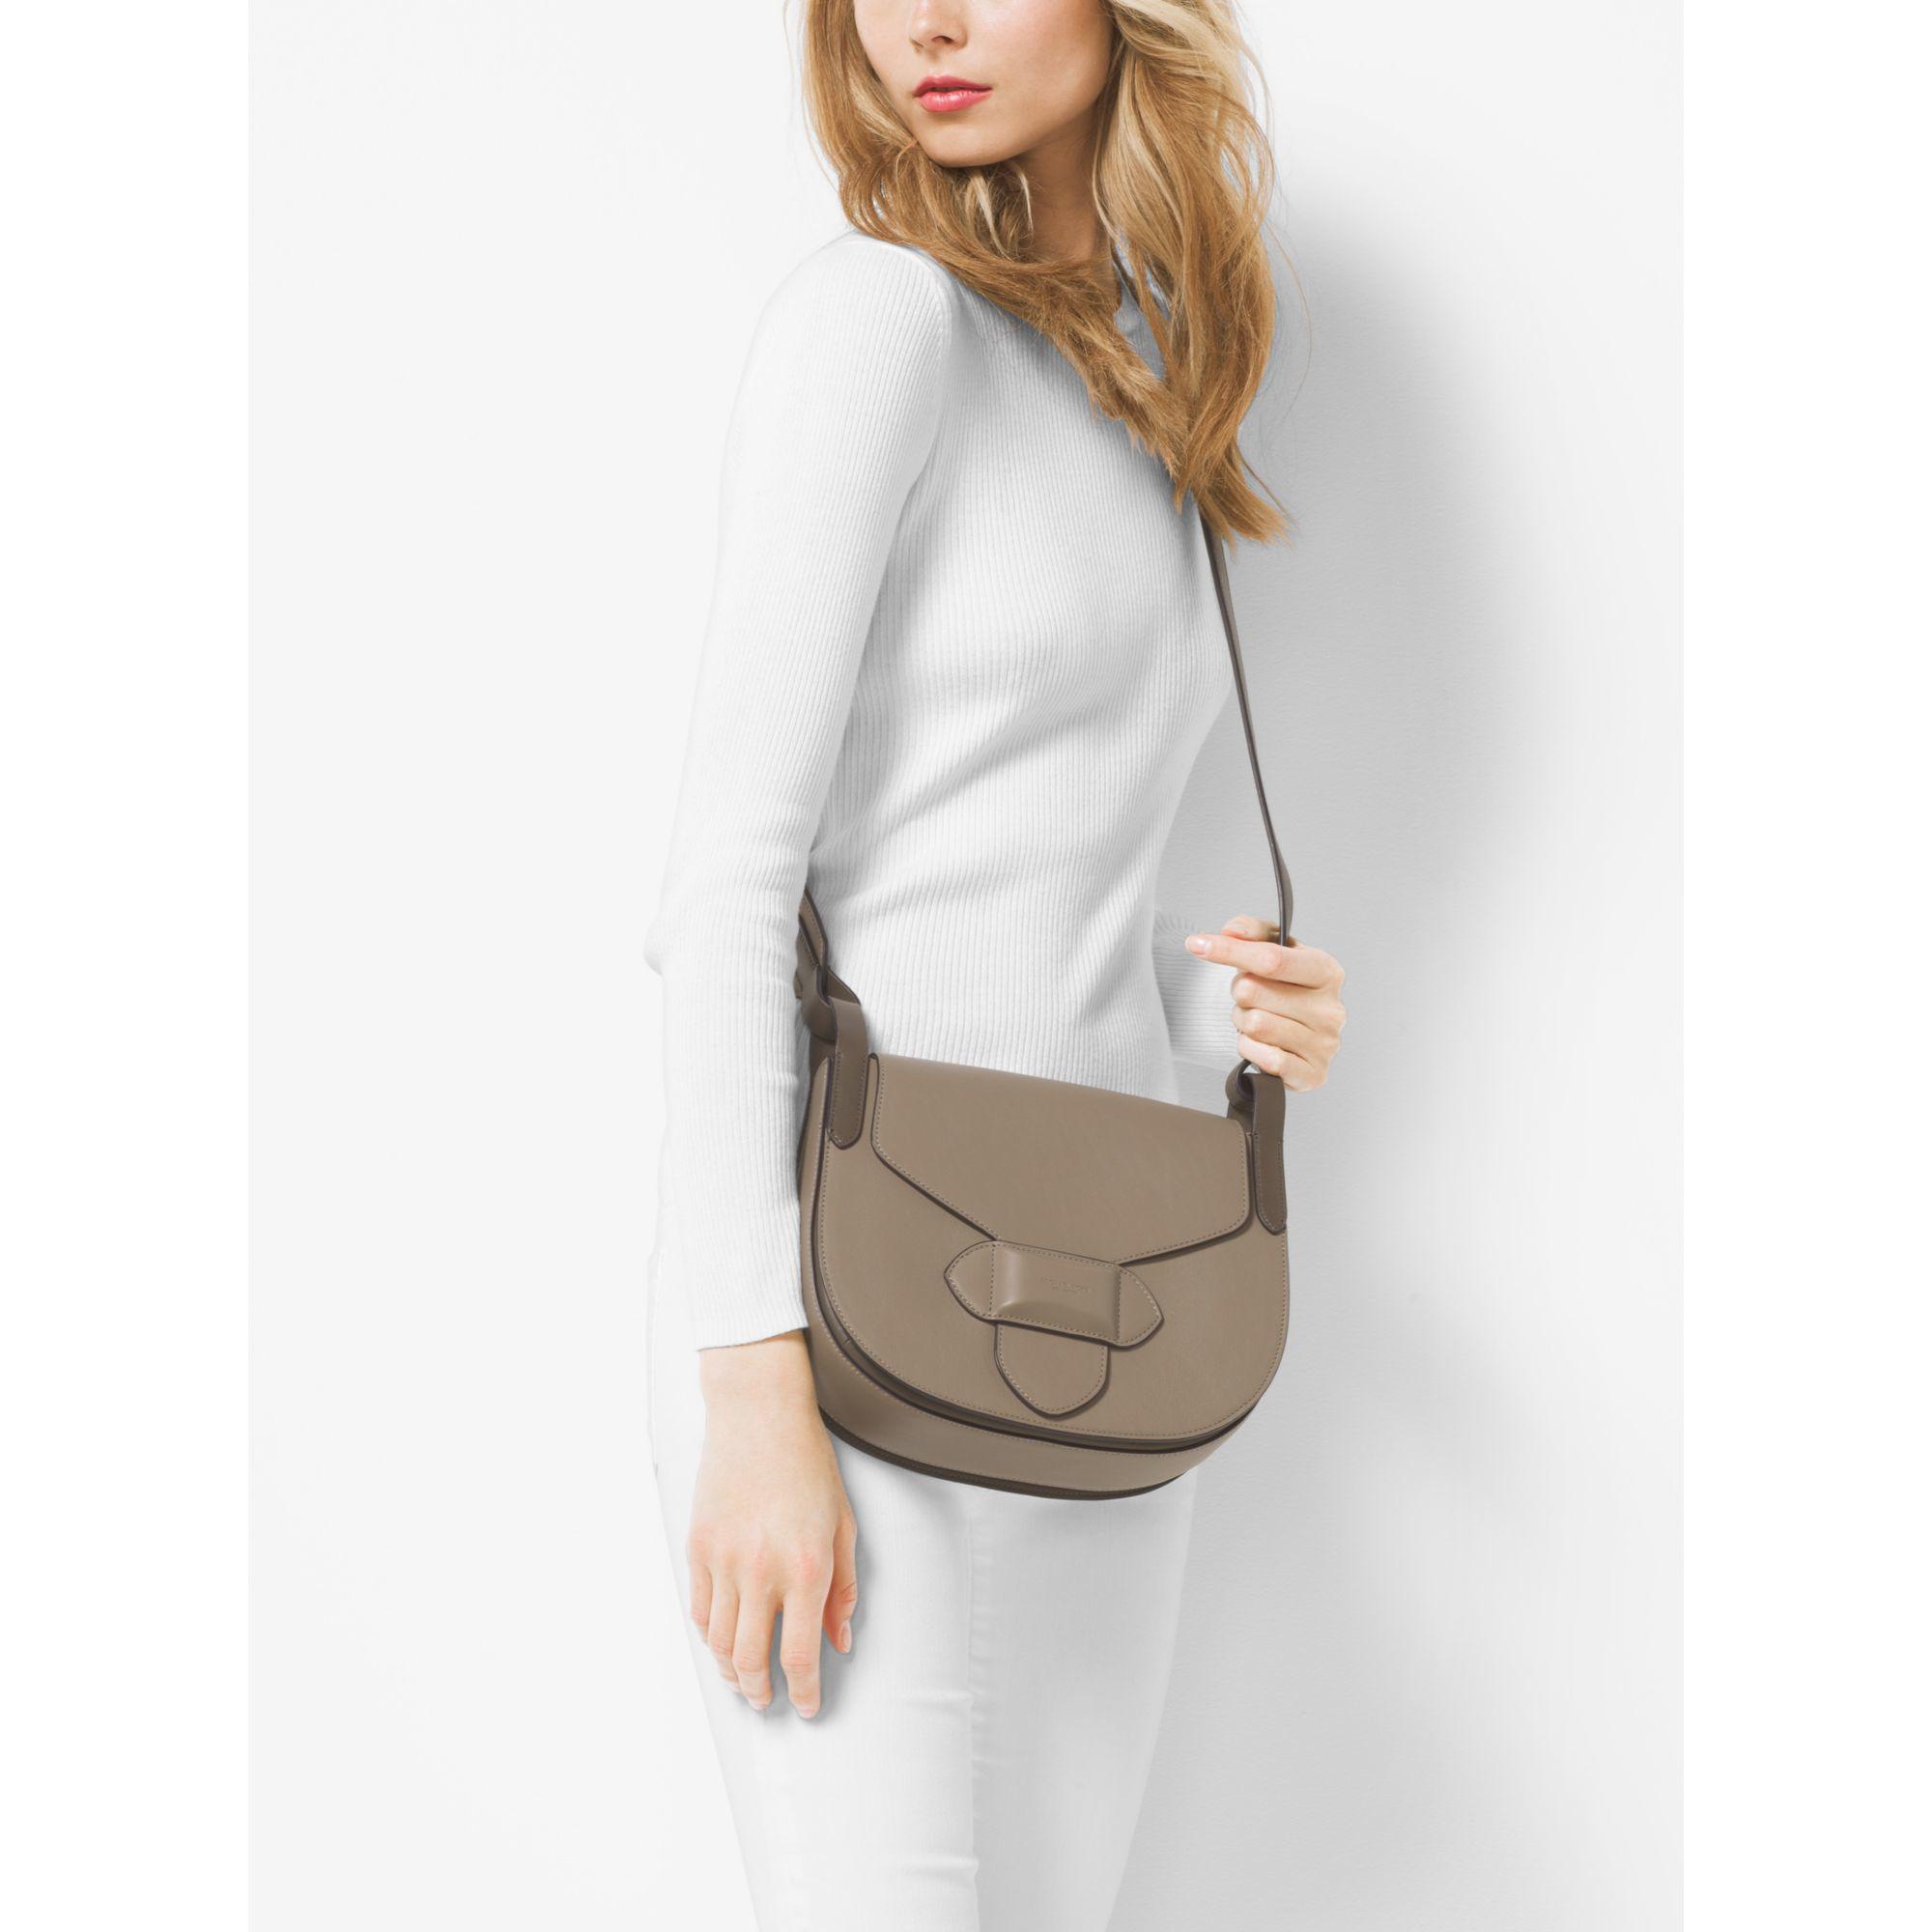 24fa01e92f99 Michael Kors Daria Medium French Calf Leather Saddlebag in Brown - Lyst